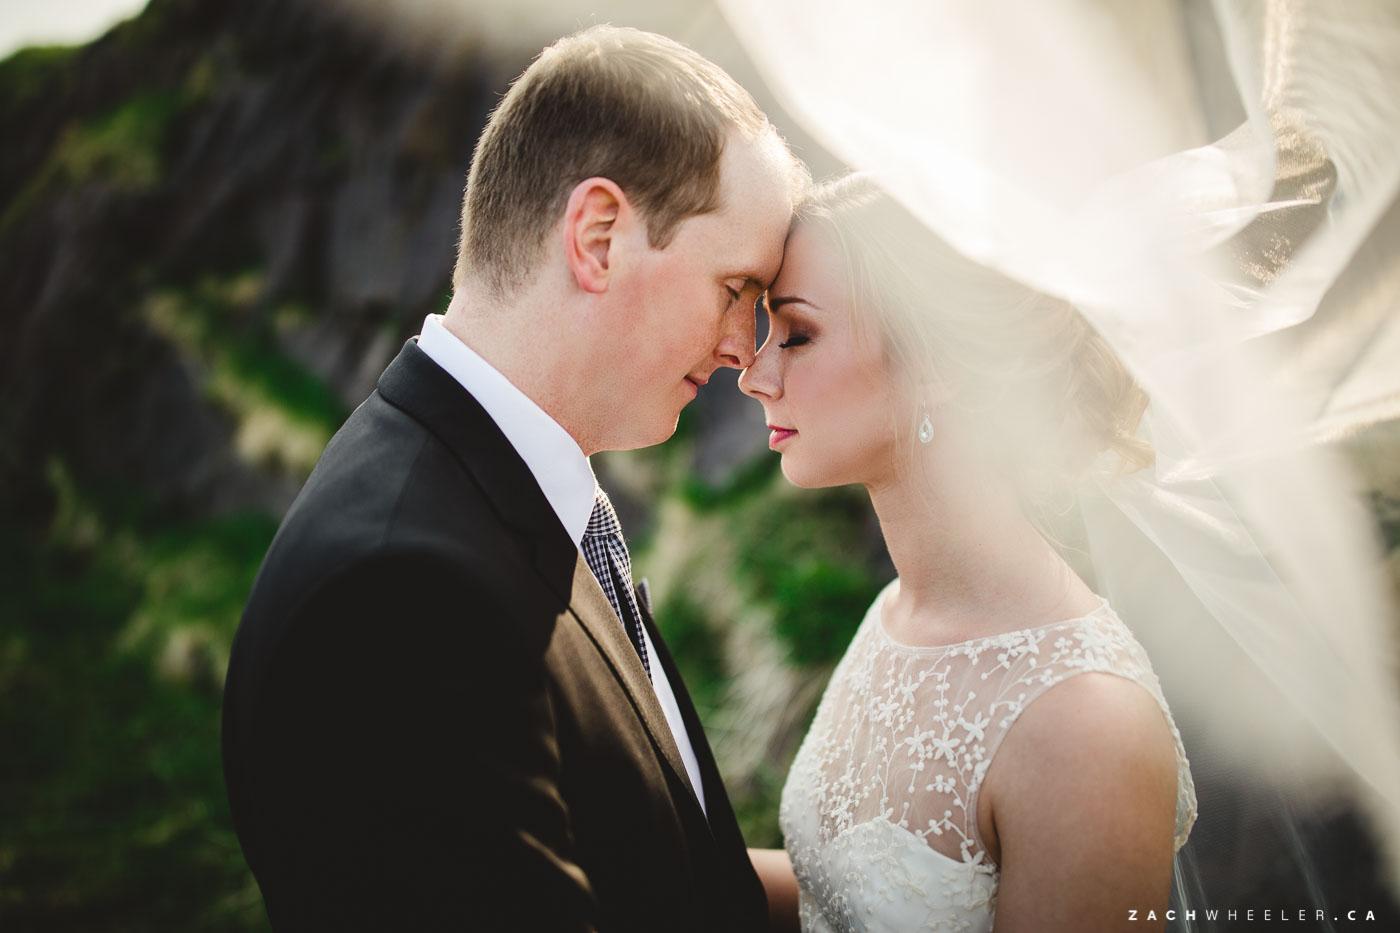 Sarah-Grant-Lesters-Fram-Wedding-53